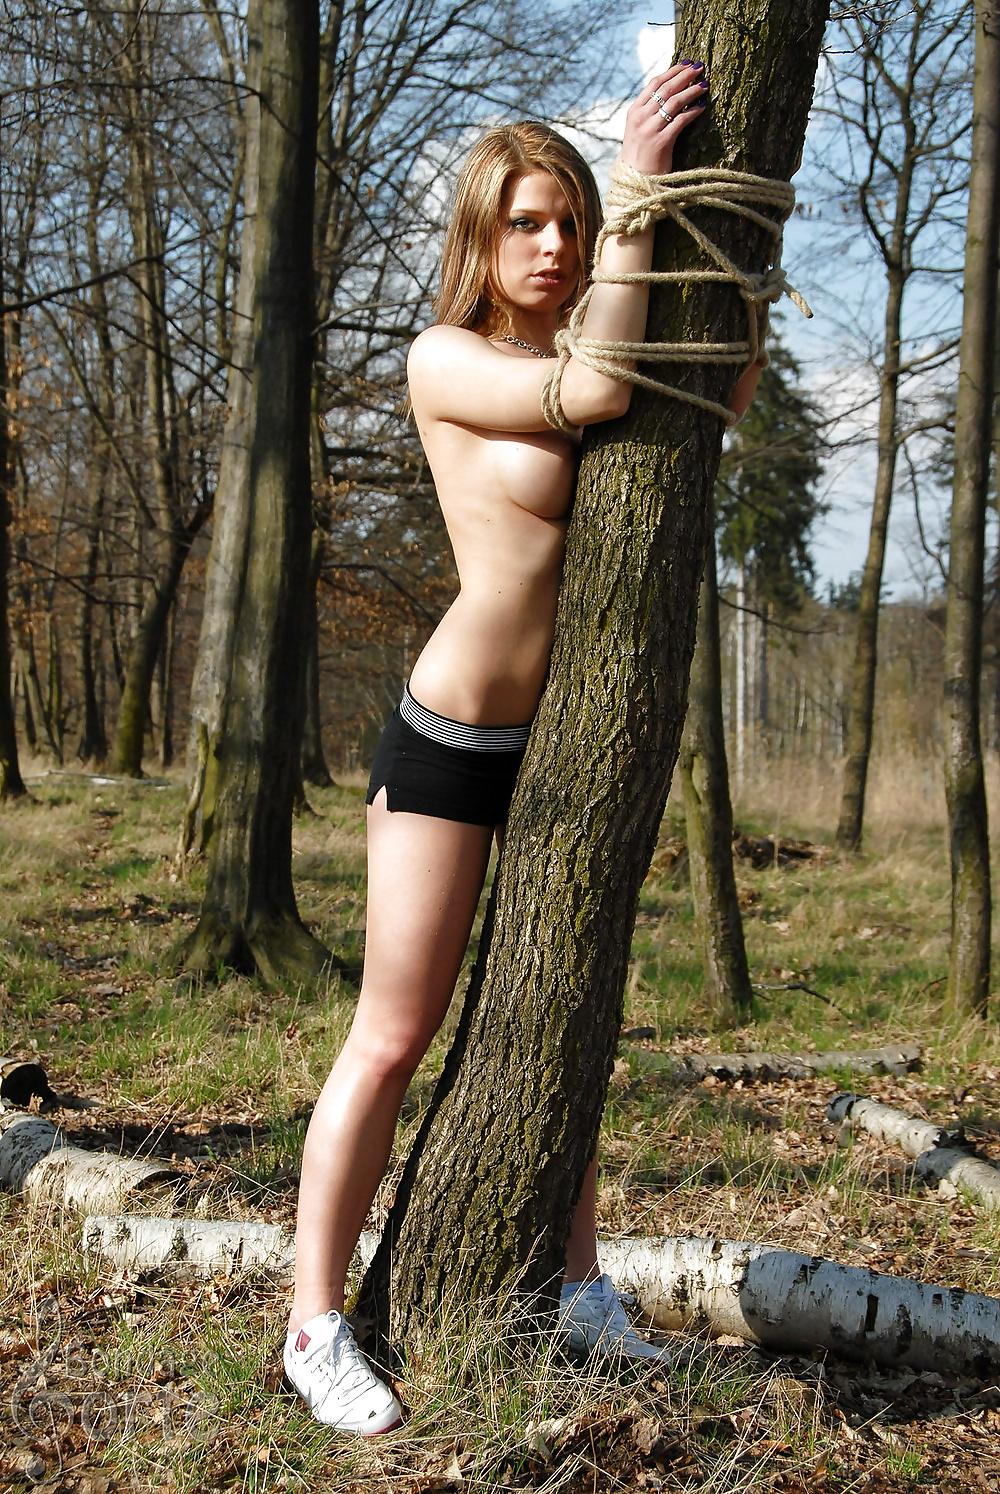 ещё секс с веревками на природе после